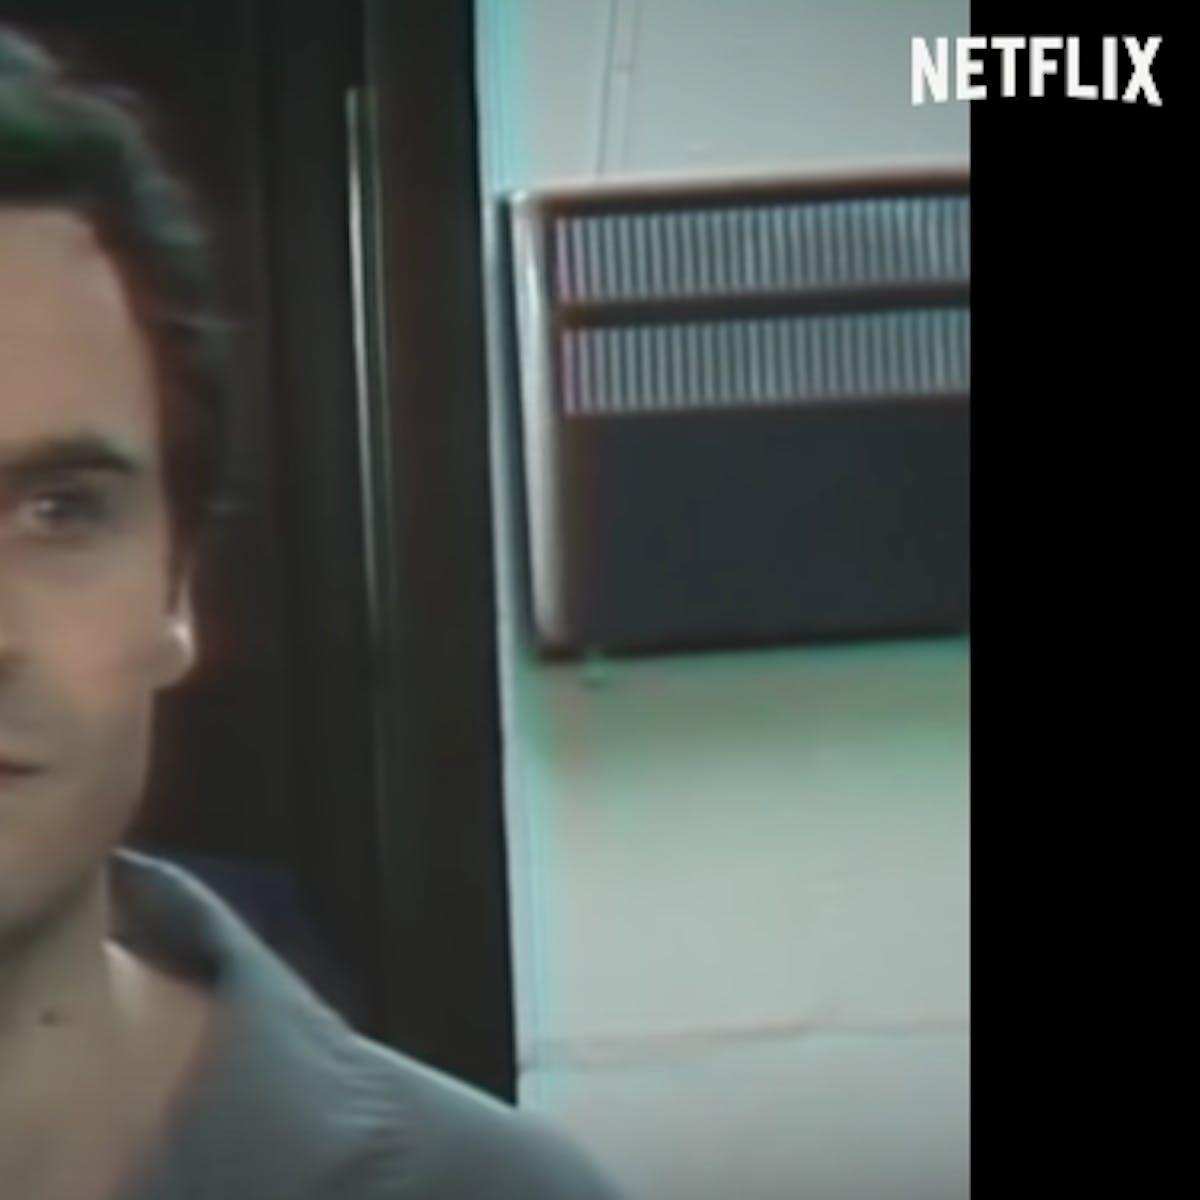 Ted Bundy Tapes' on Netflix: Season 2 Release Date, Trailer